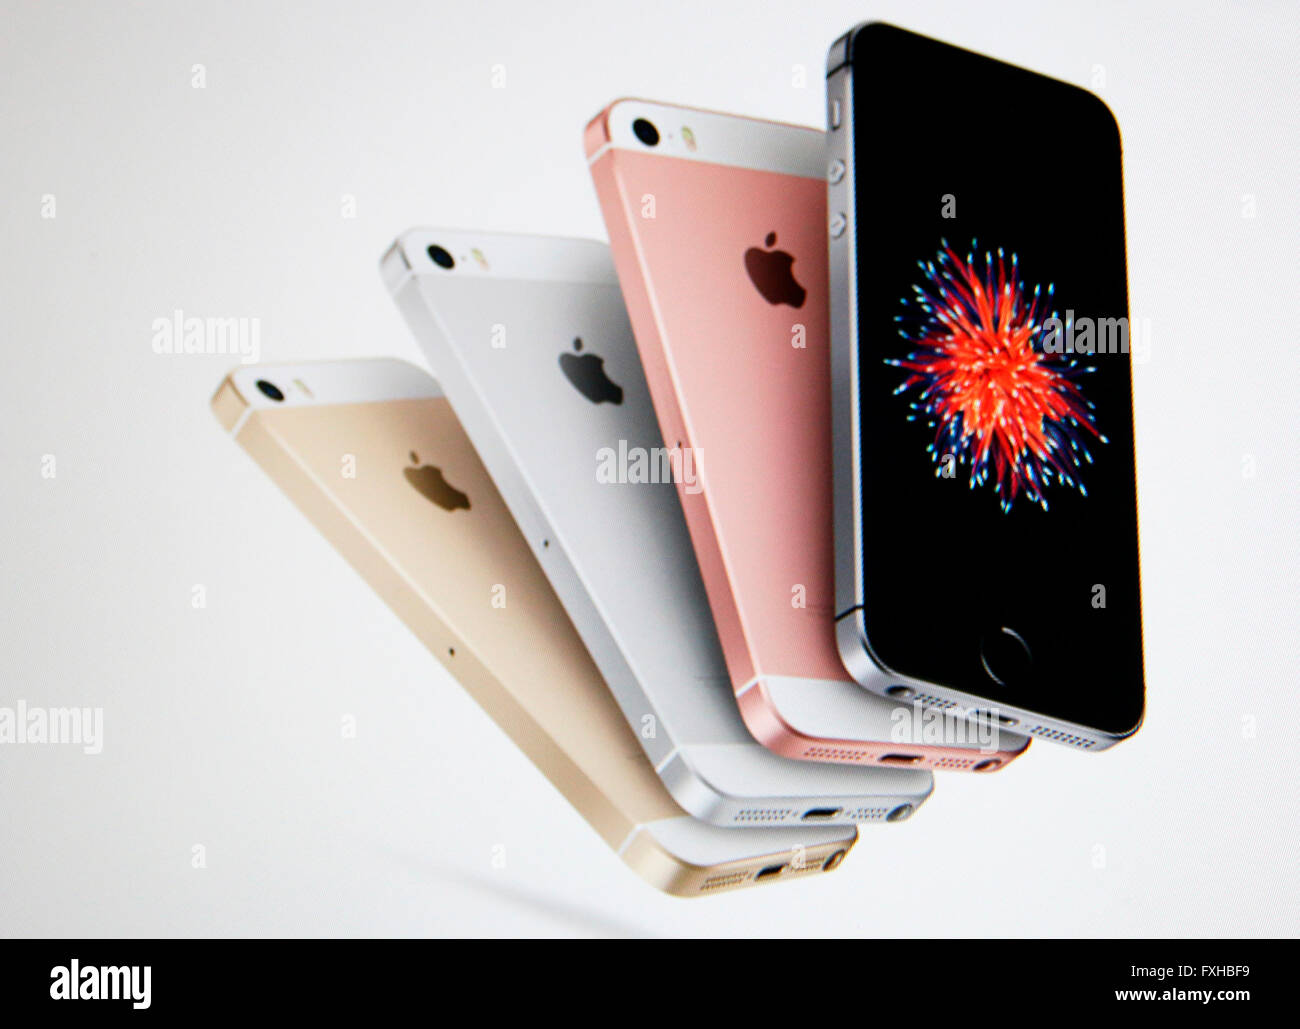 iPhone SE - Stock Image